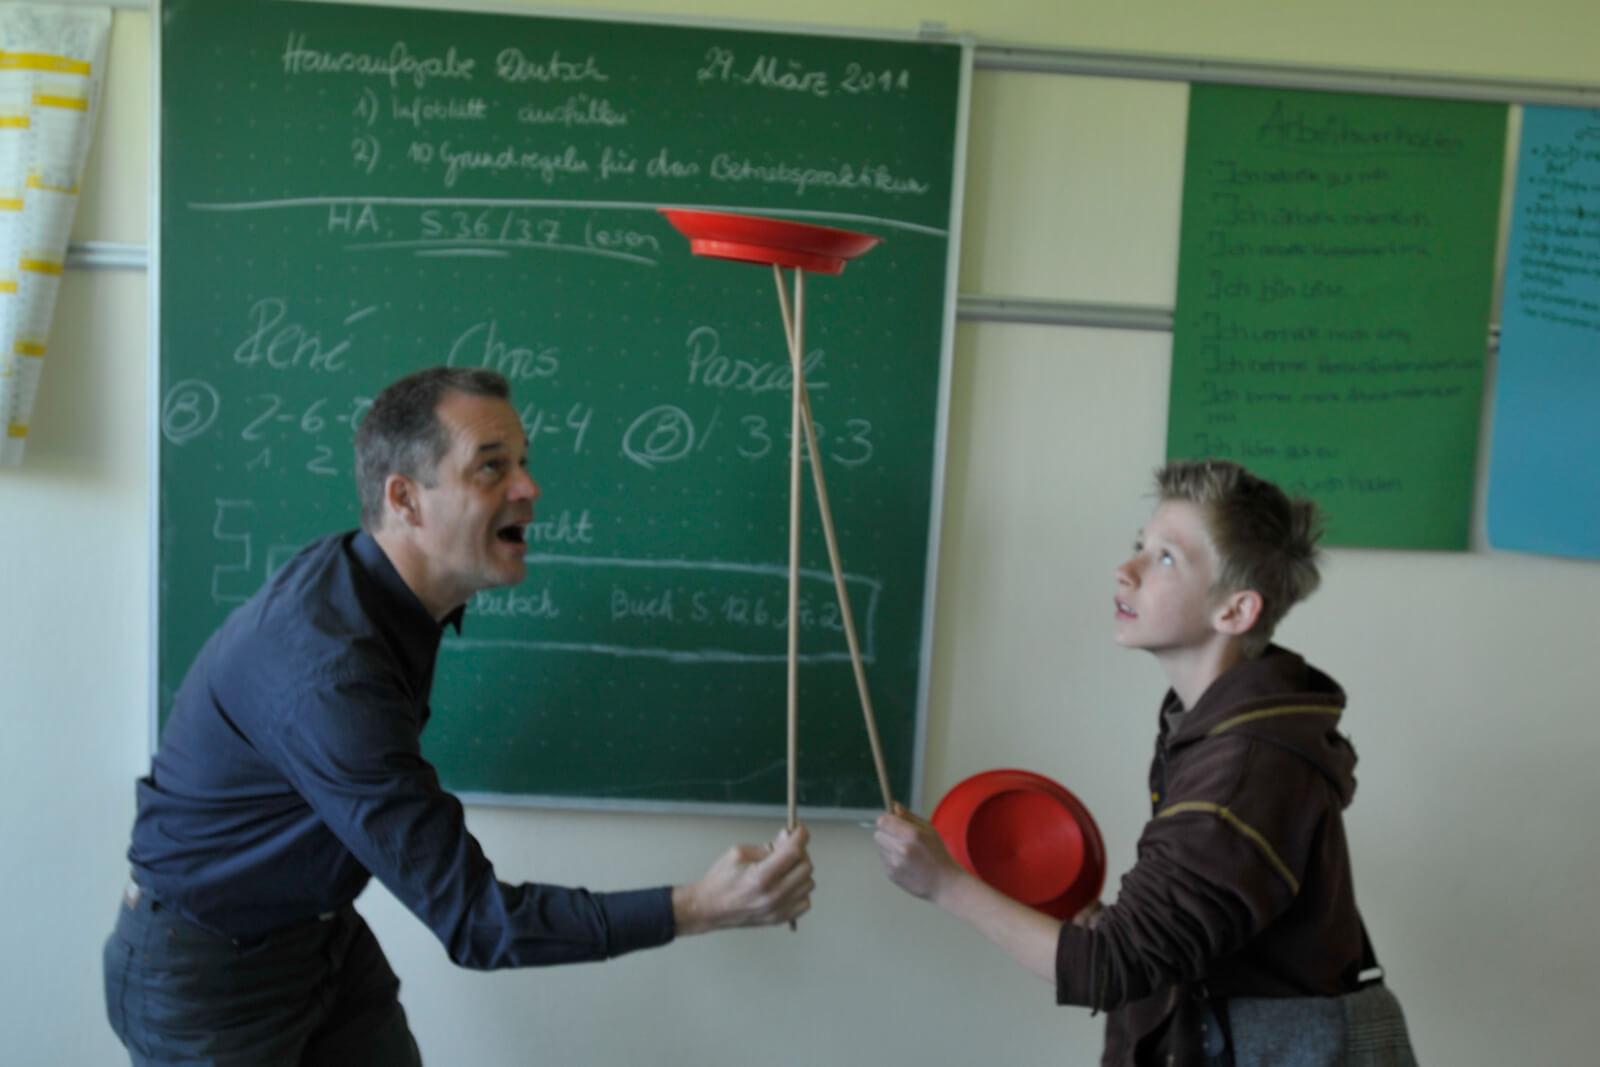 Lehrer übergibt Teller an Schüler